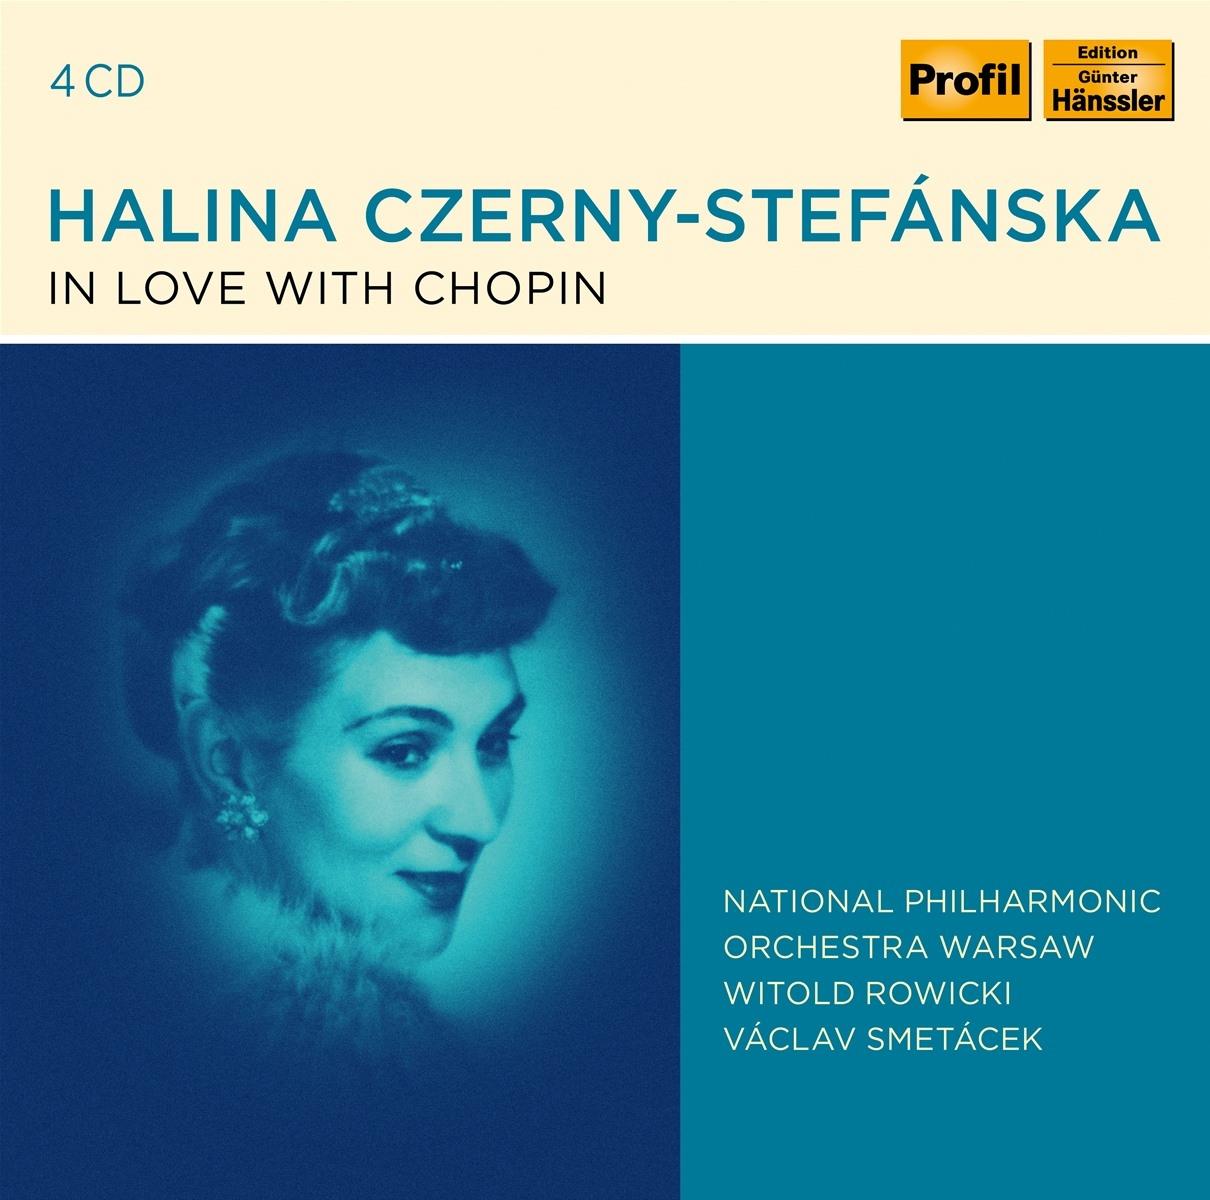 Halina Czerny-Stefanska in Love with Chopin